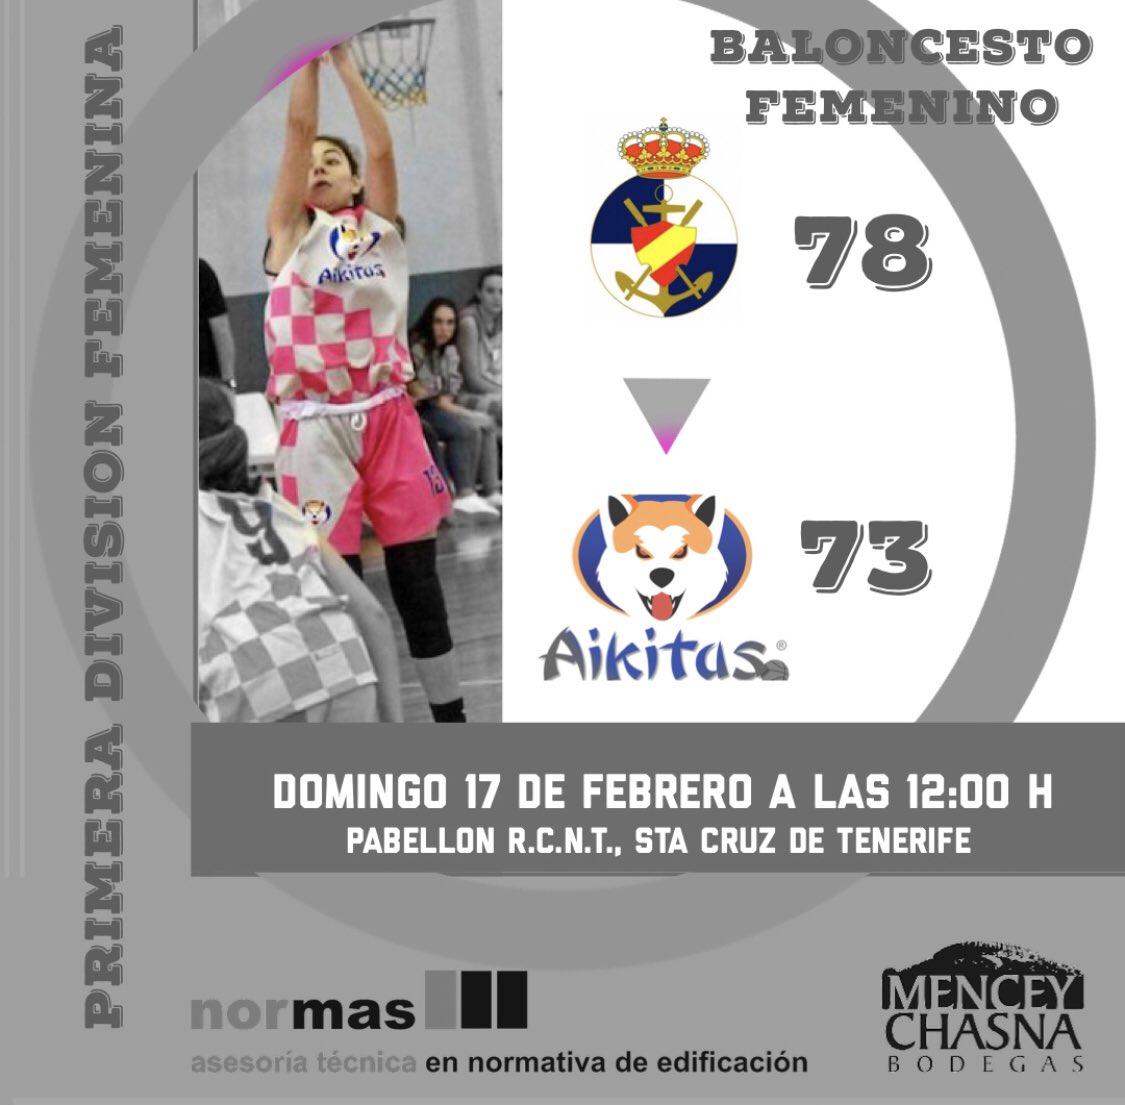 #aikitasbasket #aikitas  #baloncestofemenino #basketball #santacruzdetenerife #tenerife #Tenerifelicidad #normasasesoriatecnica @normas_at http://www.normasasesoriatecnica.com #bodegasmenceychasna http://menceychasna.com